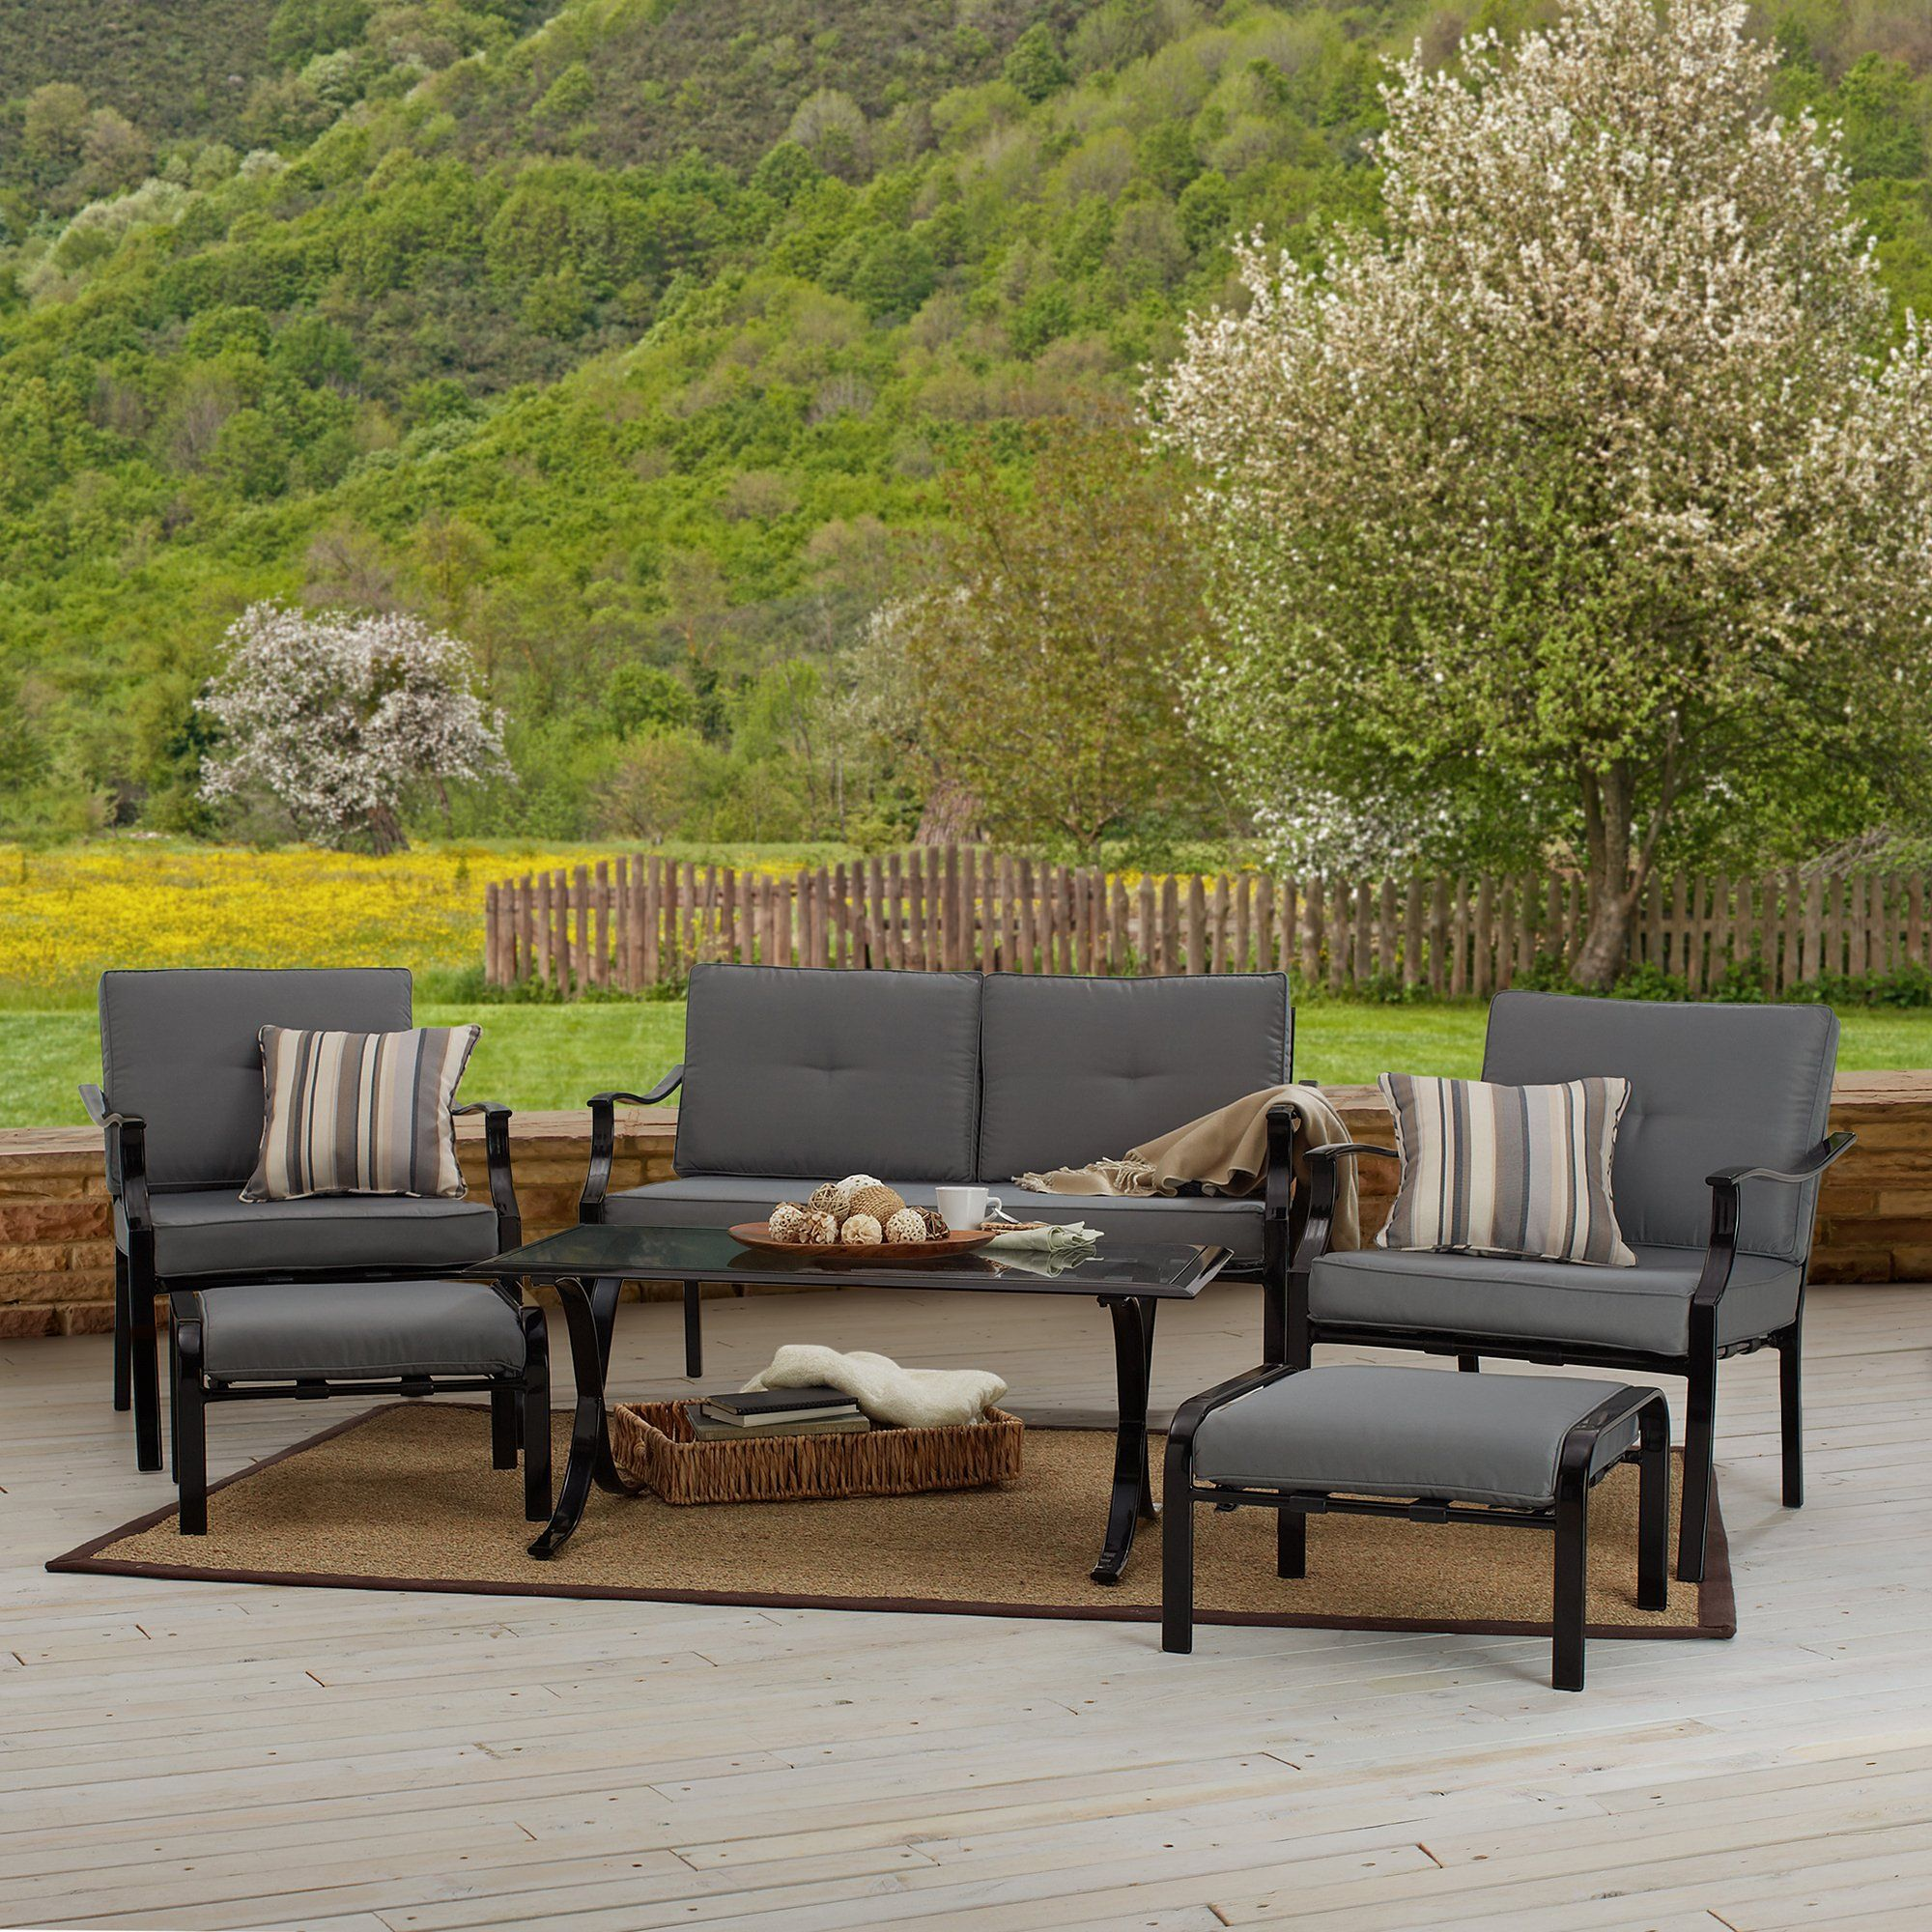 Amazon Com Strathwood 6 Piece All Weather Furniture Set Patio